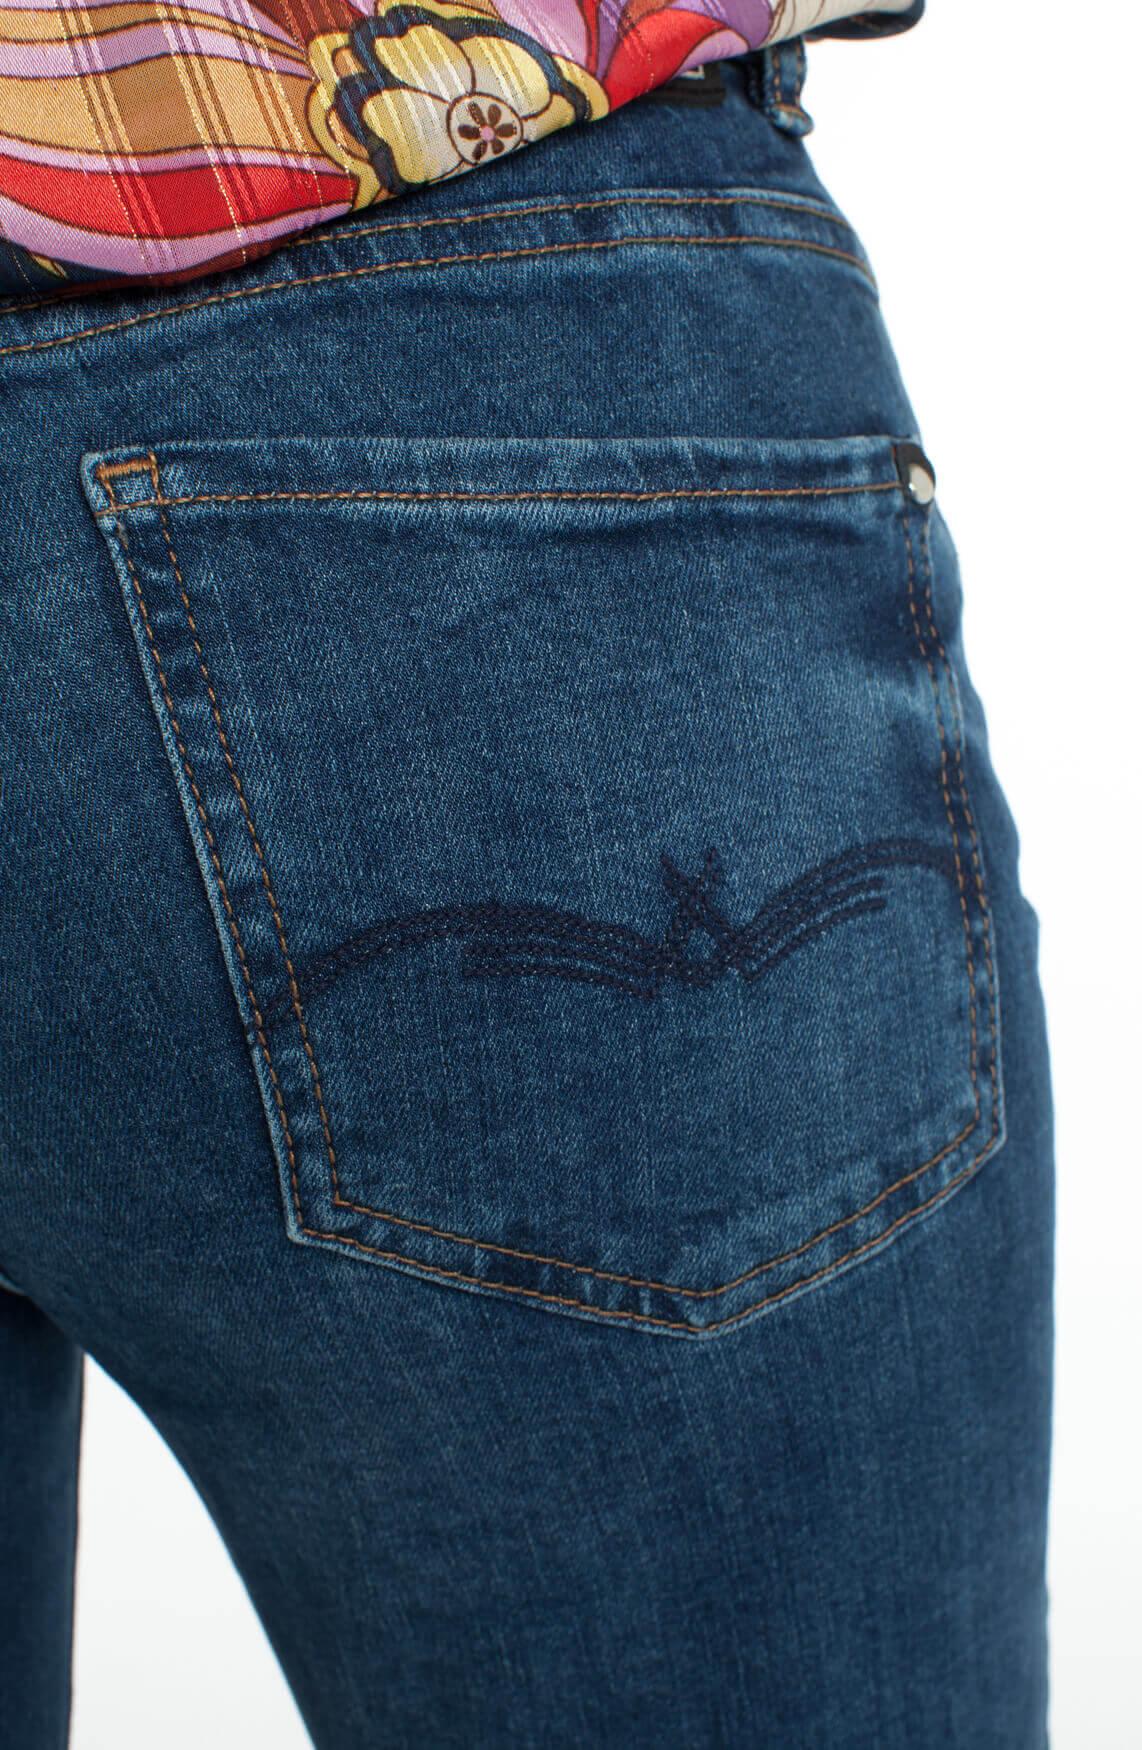 Mos Mosh Dames Sumner flared jeans Blauw